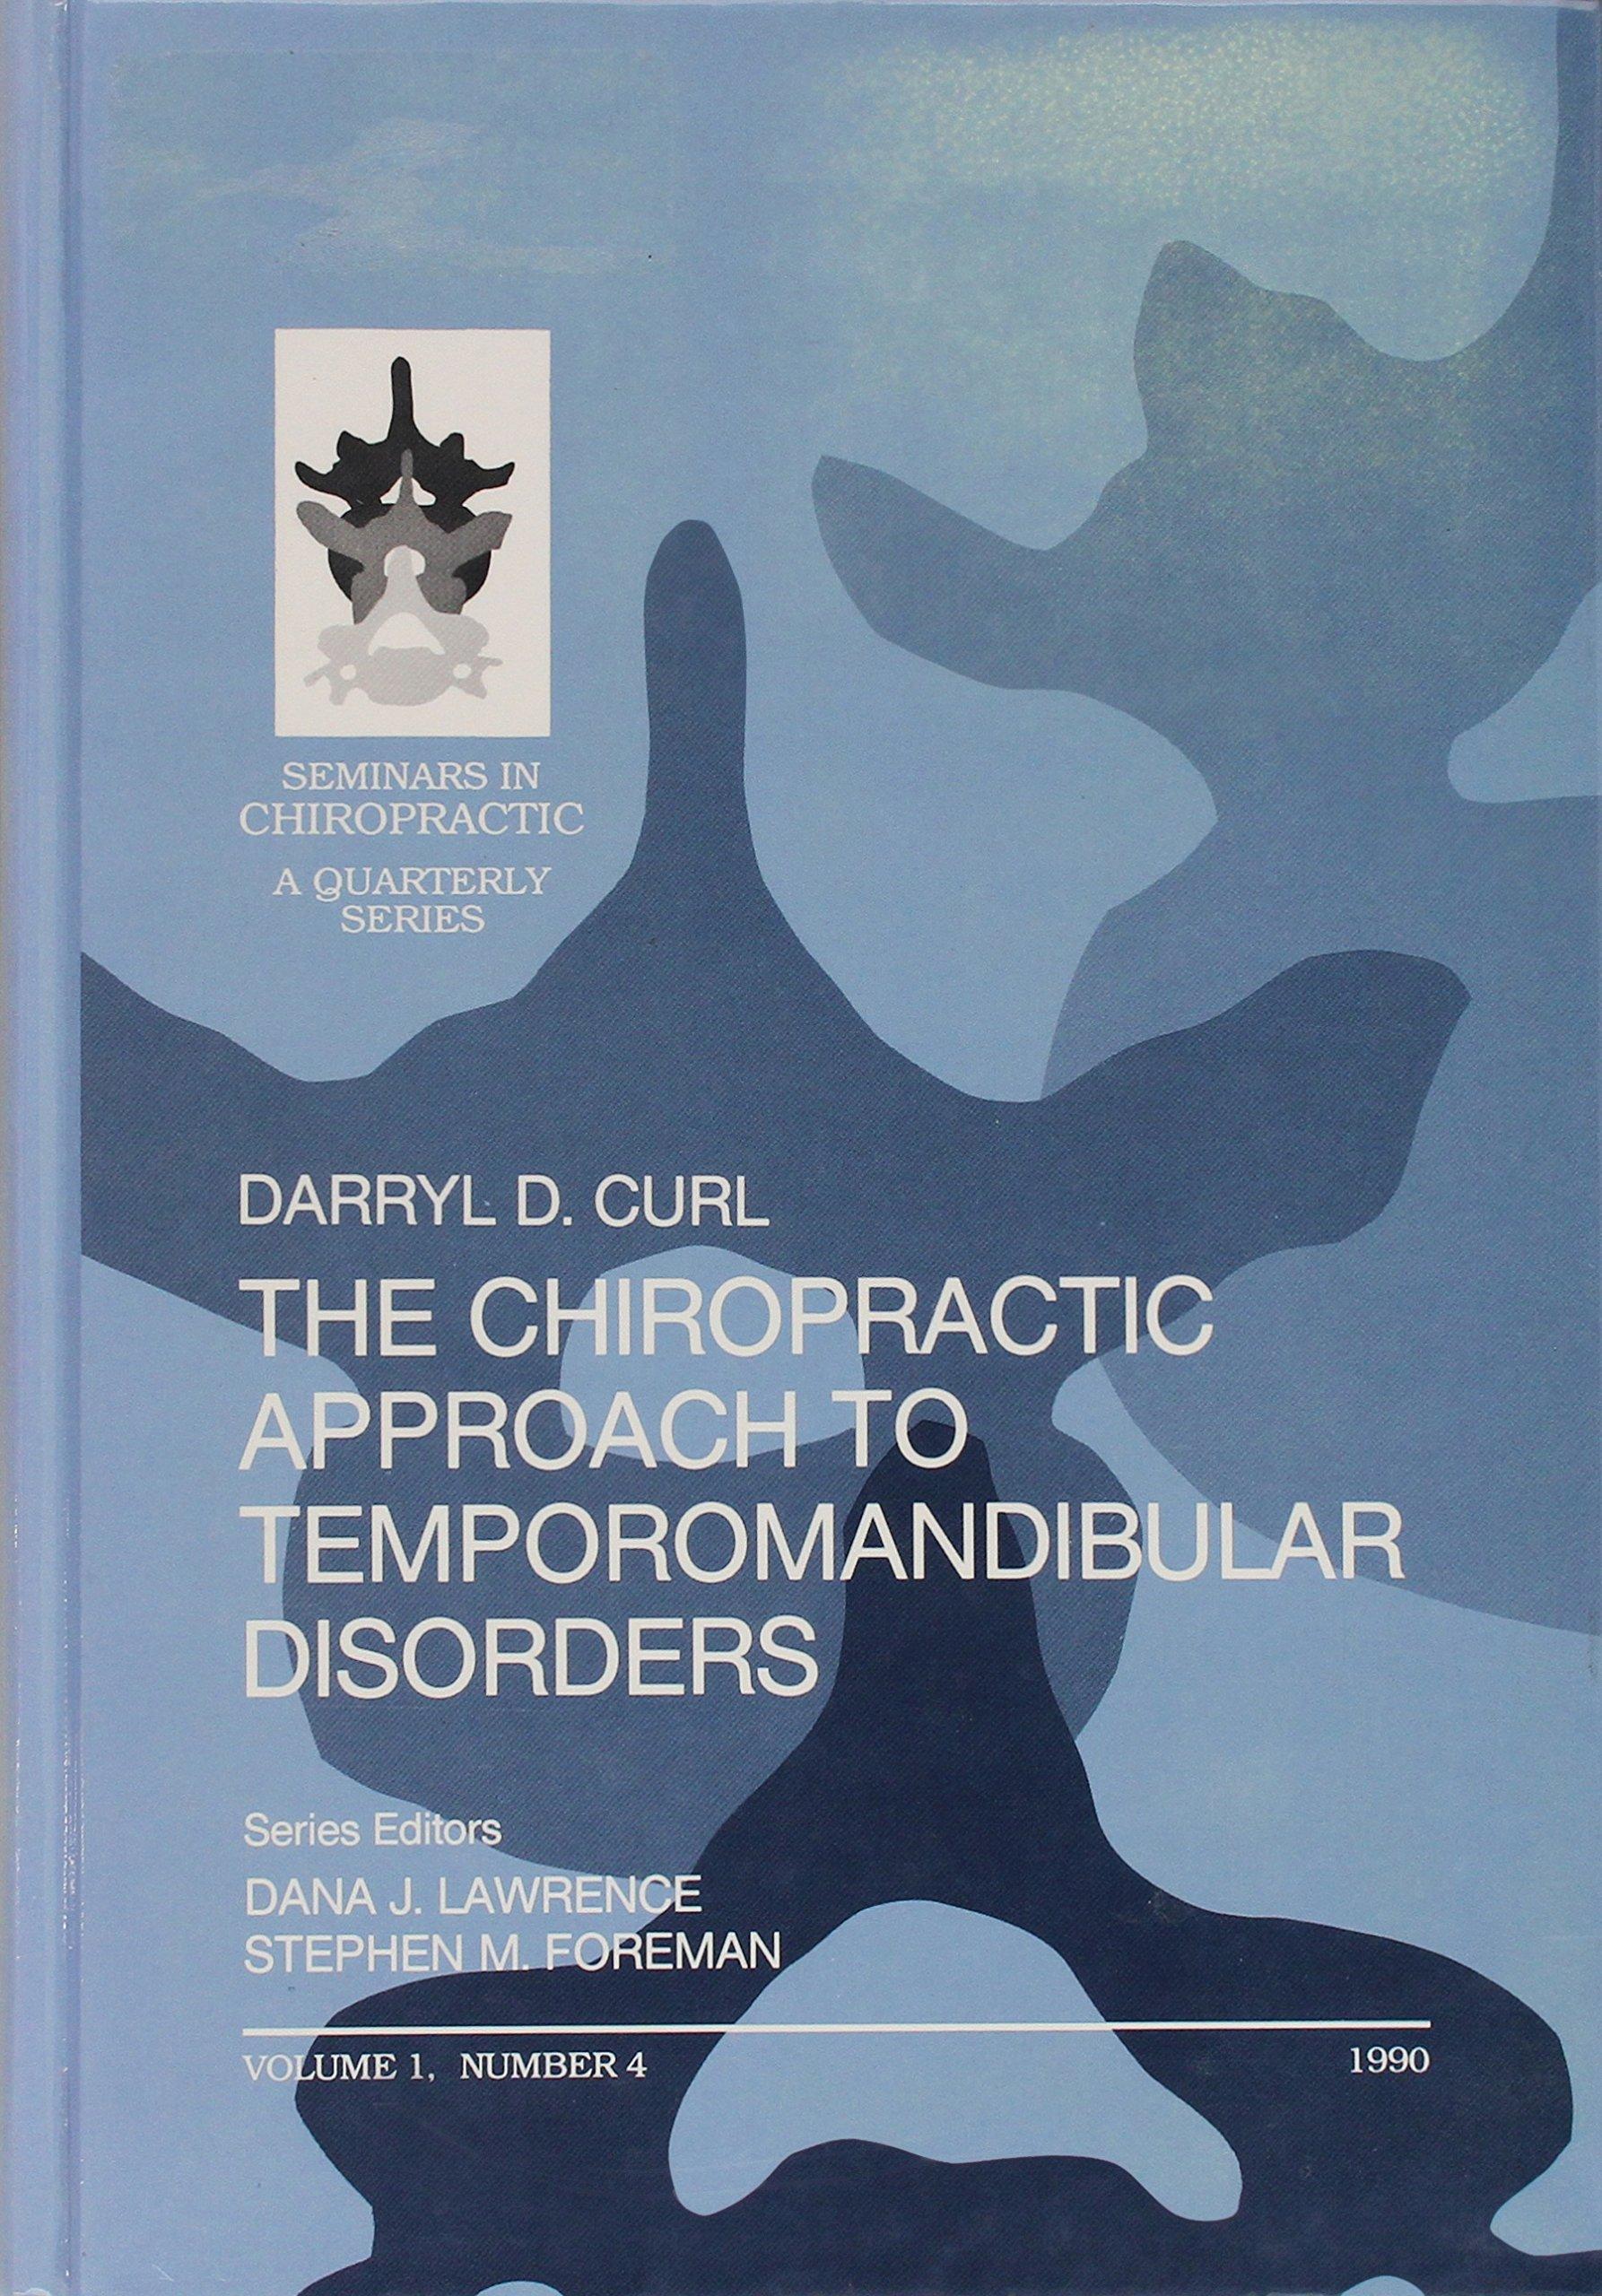 The Chiropractic Approach to Temporomandibular Disorders